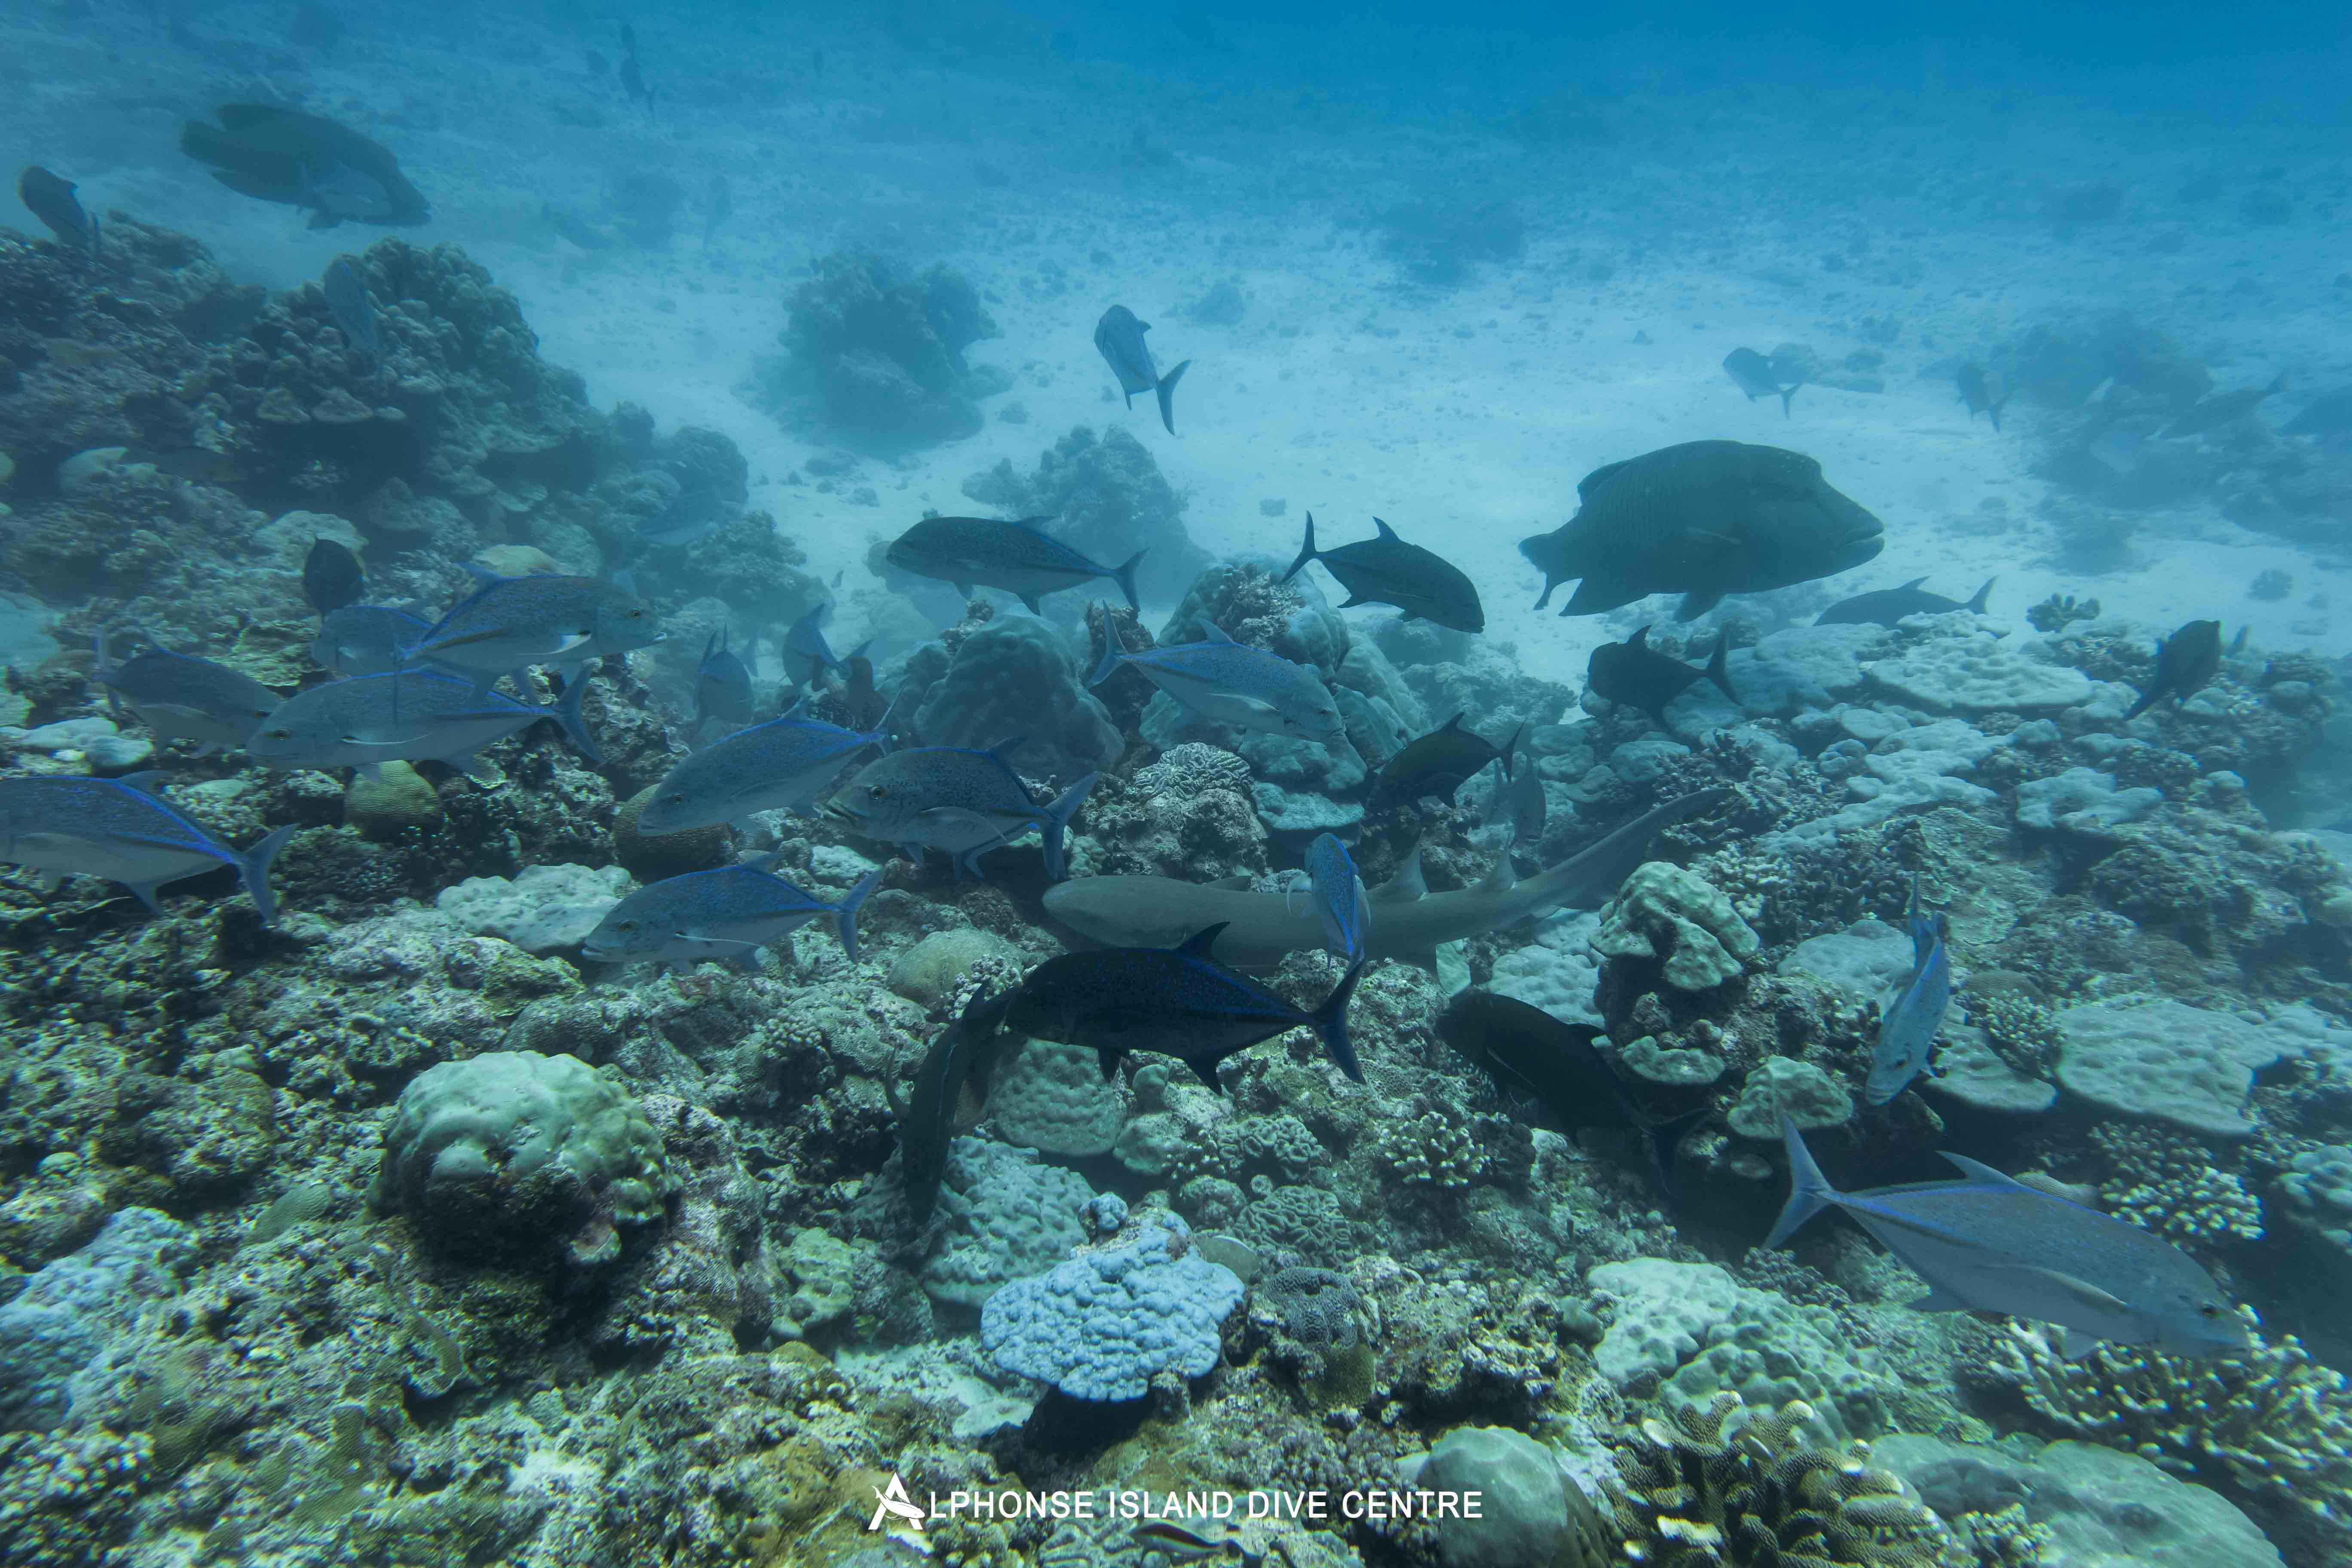 Aardvark McLeod Alphonse Island diving